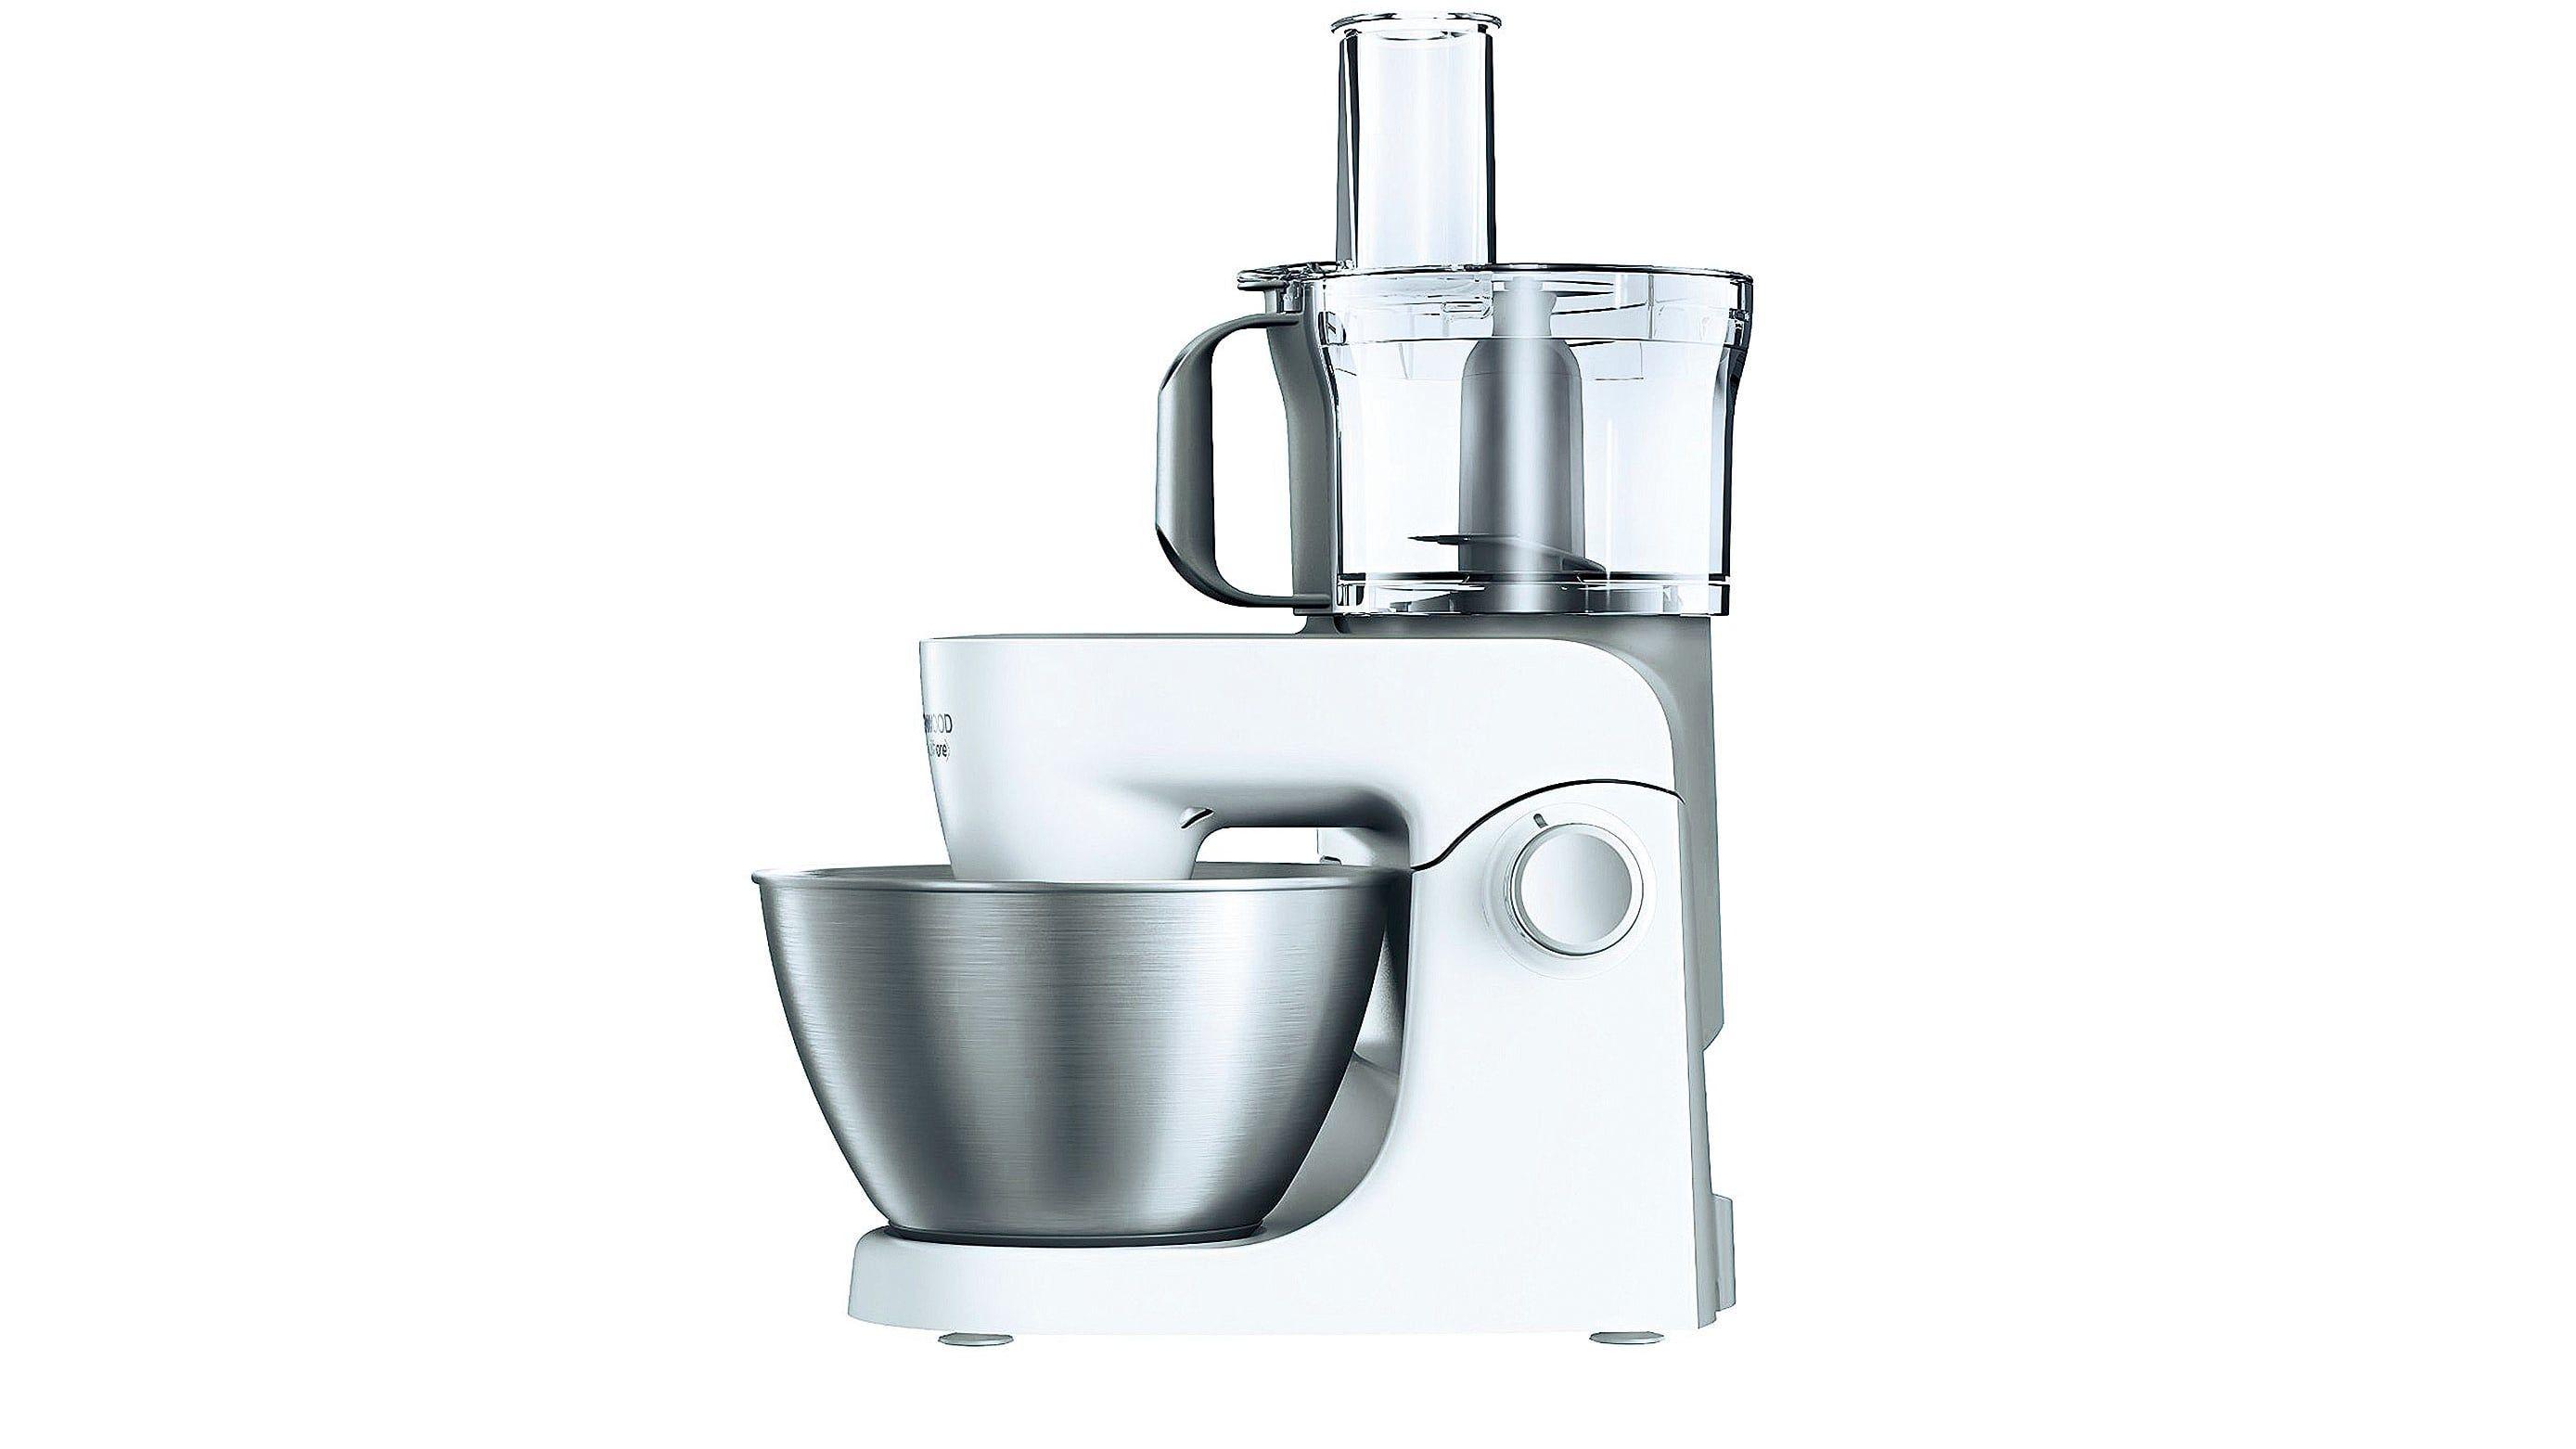 Kenwood MultiOne Stand Mixer - White | House Wish List | Pinterest ...